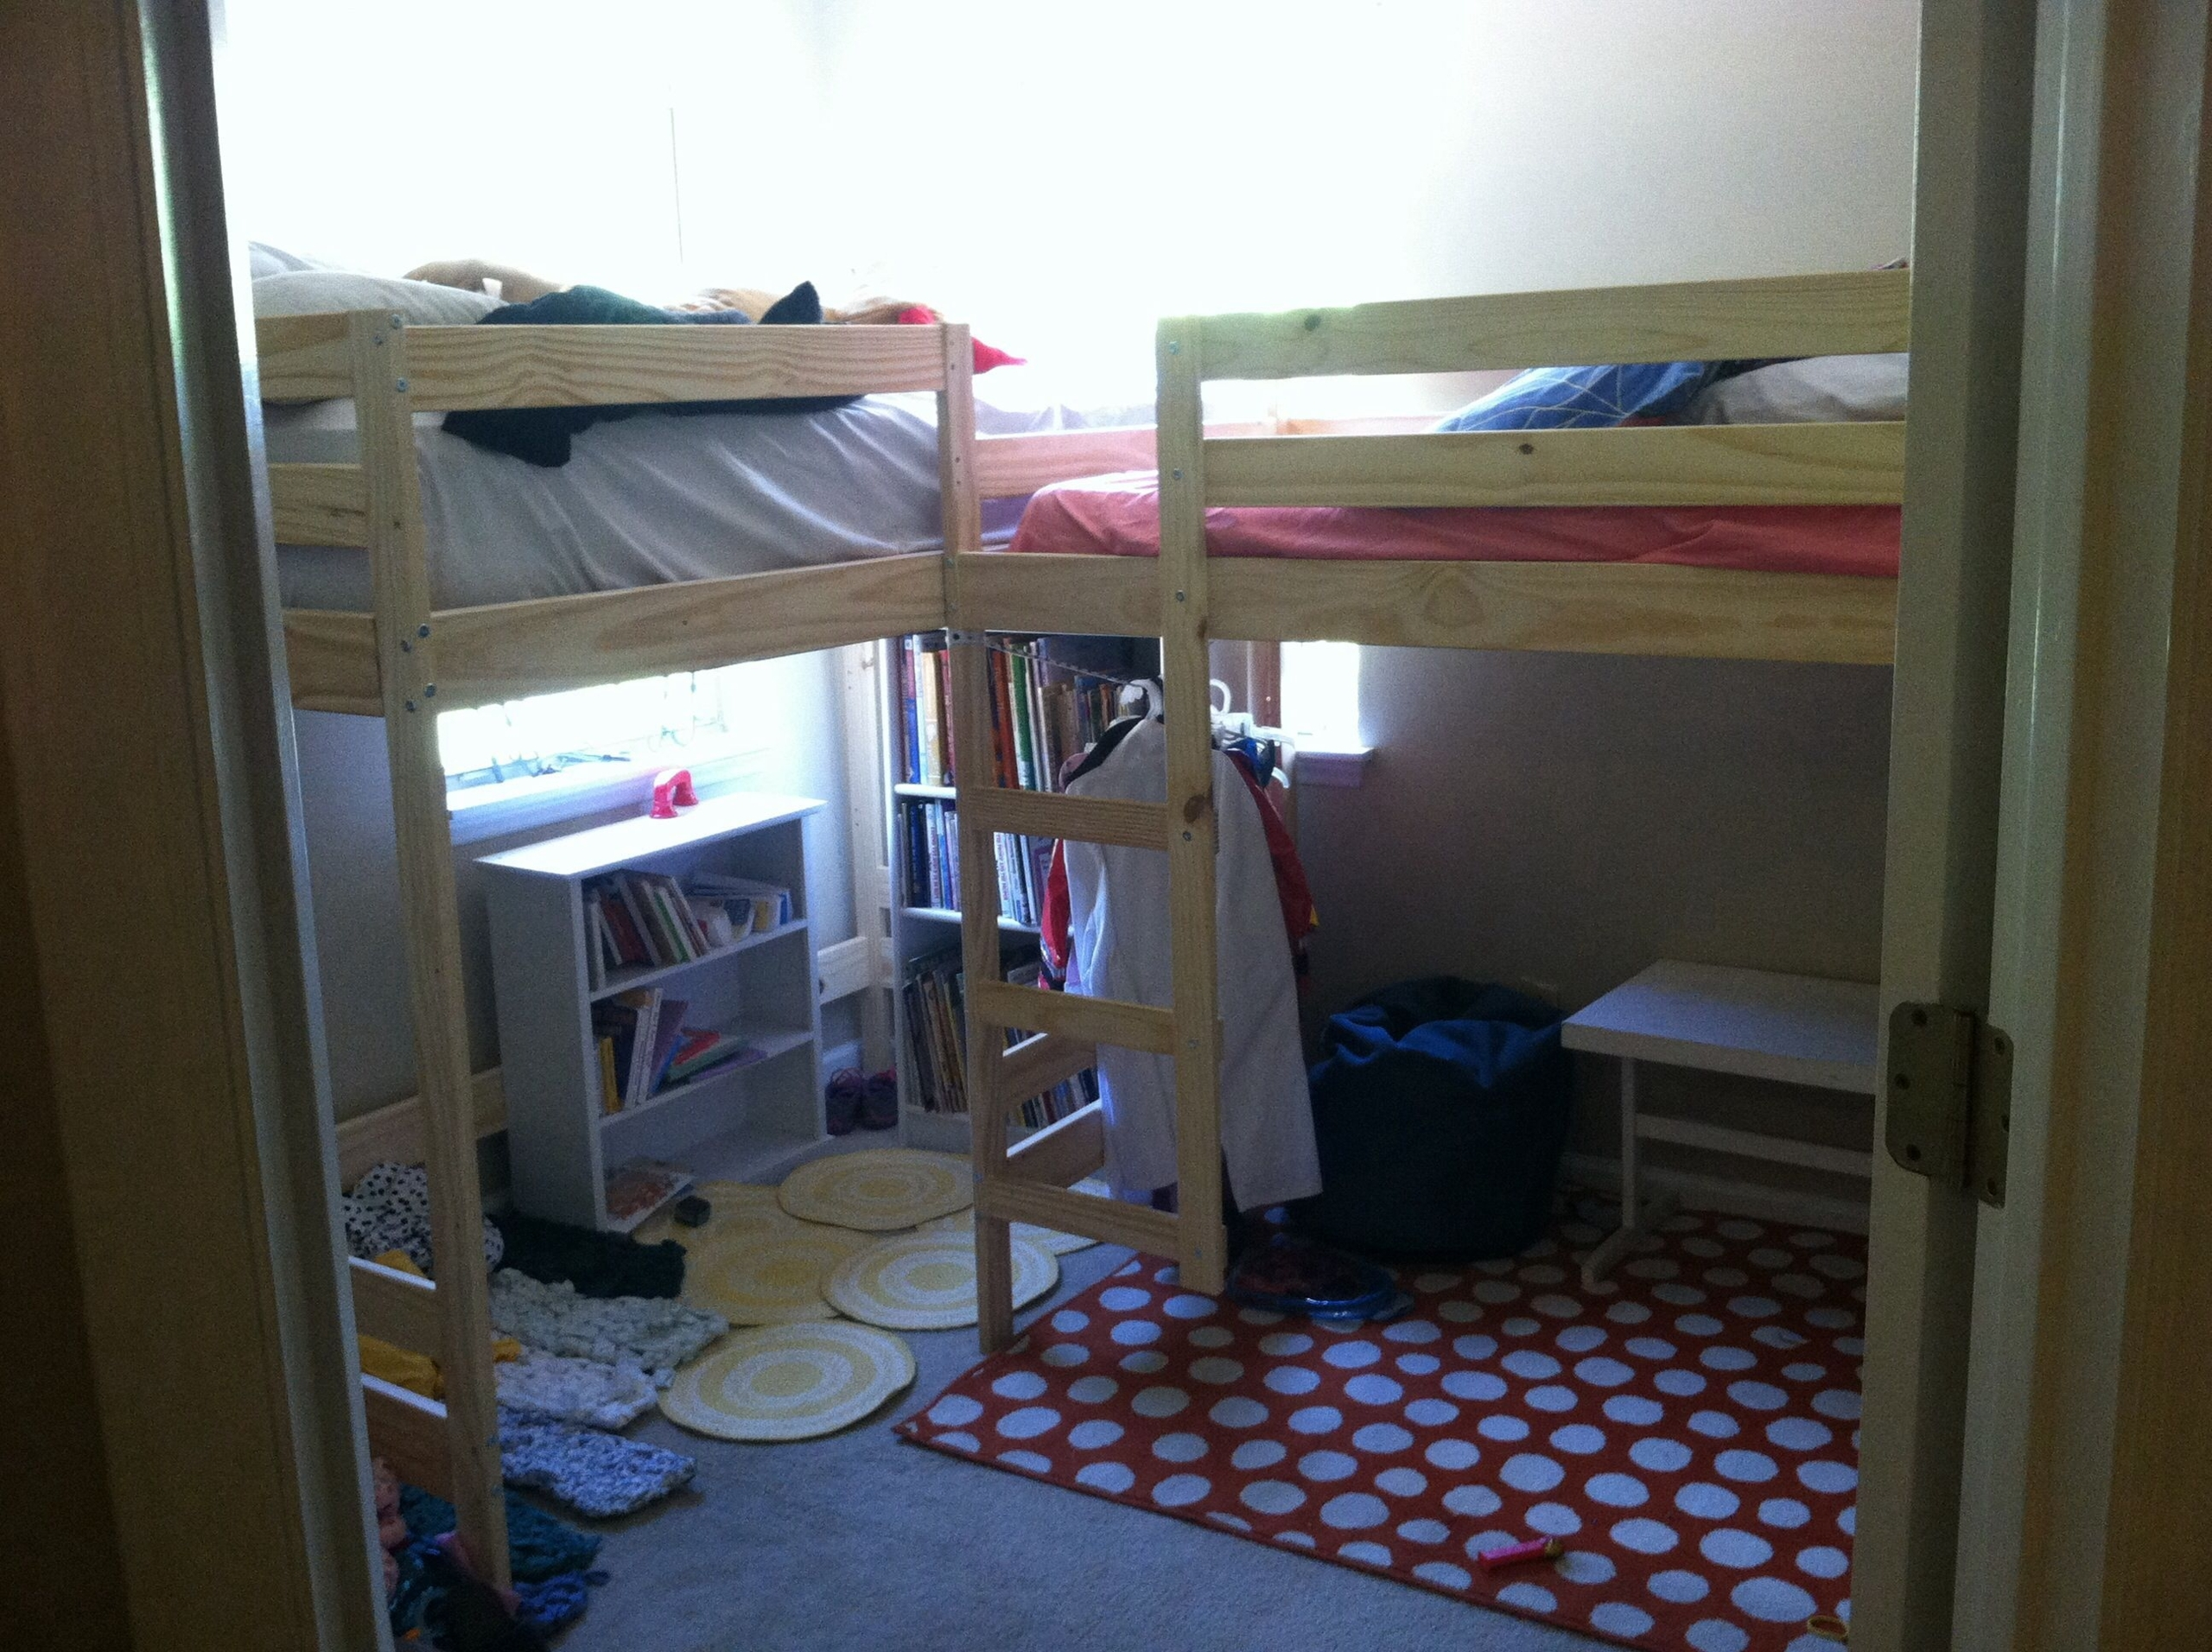 L Shaped Bunk Beds For Kids Ideas On Foter